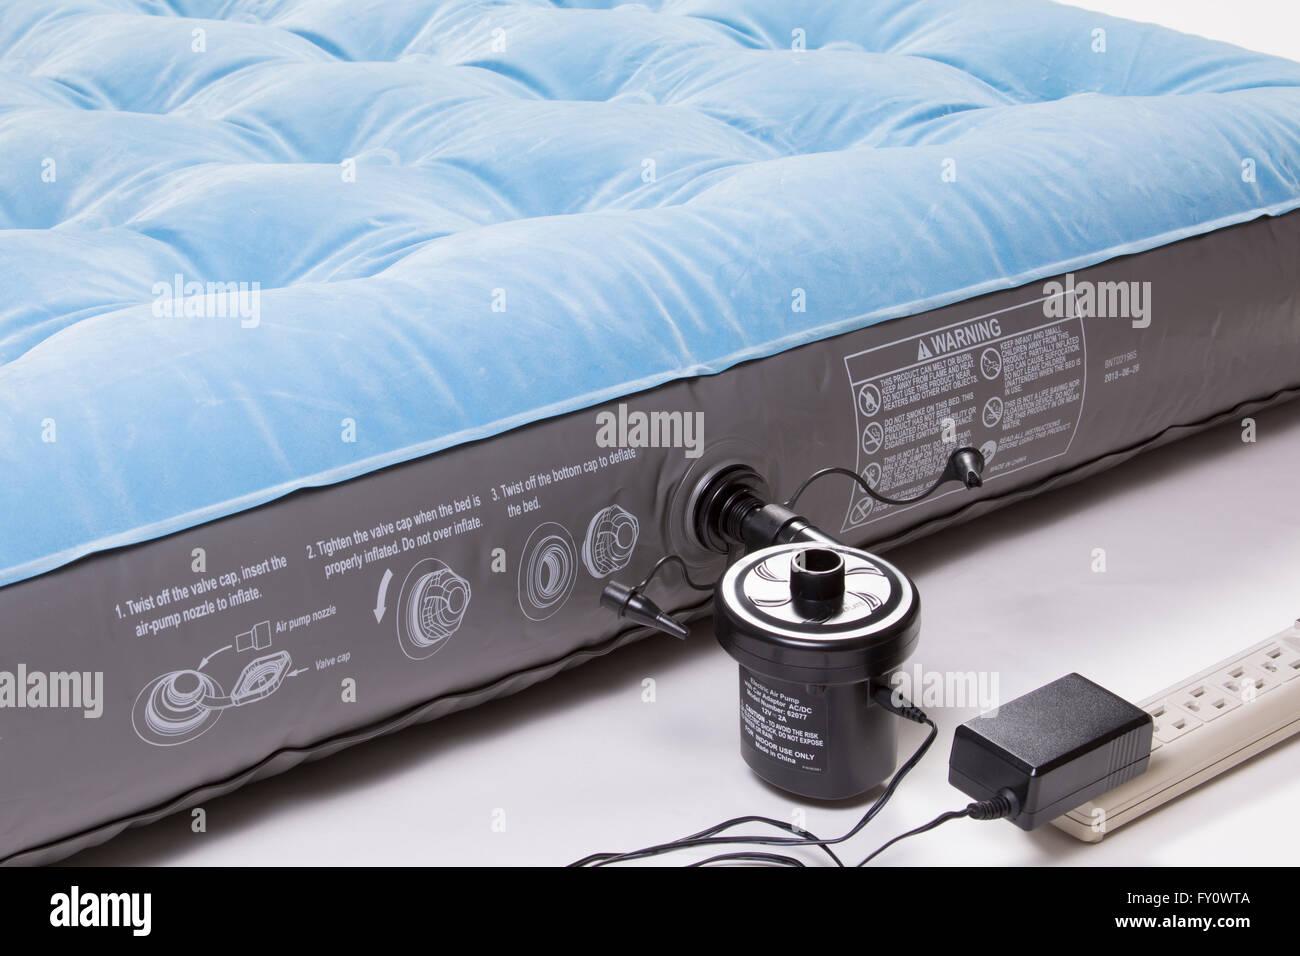 Air Mattress with Electric Pump